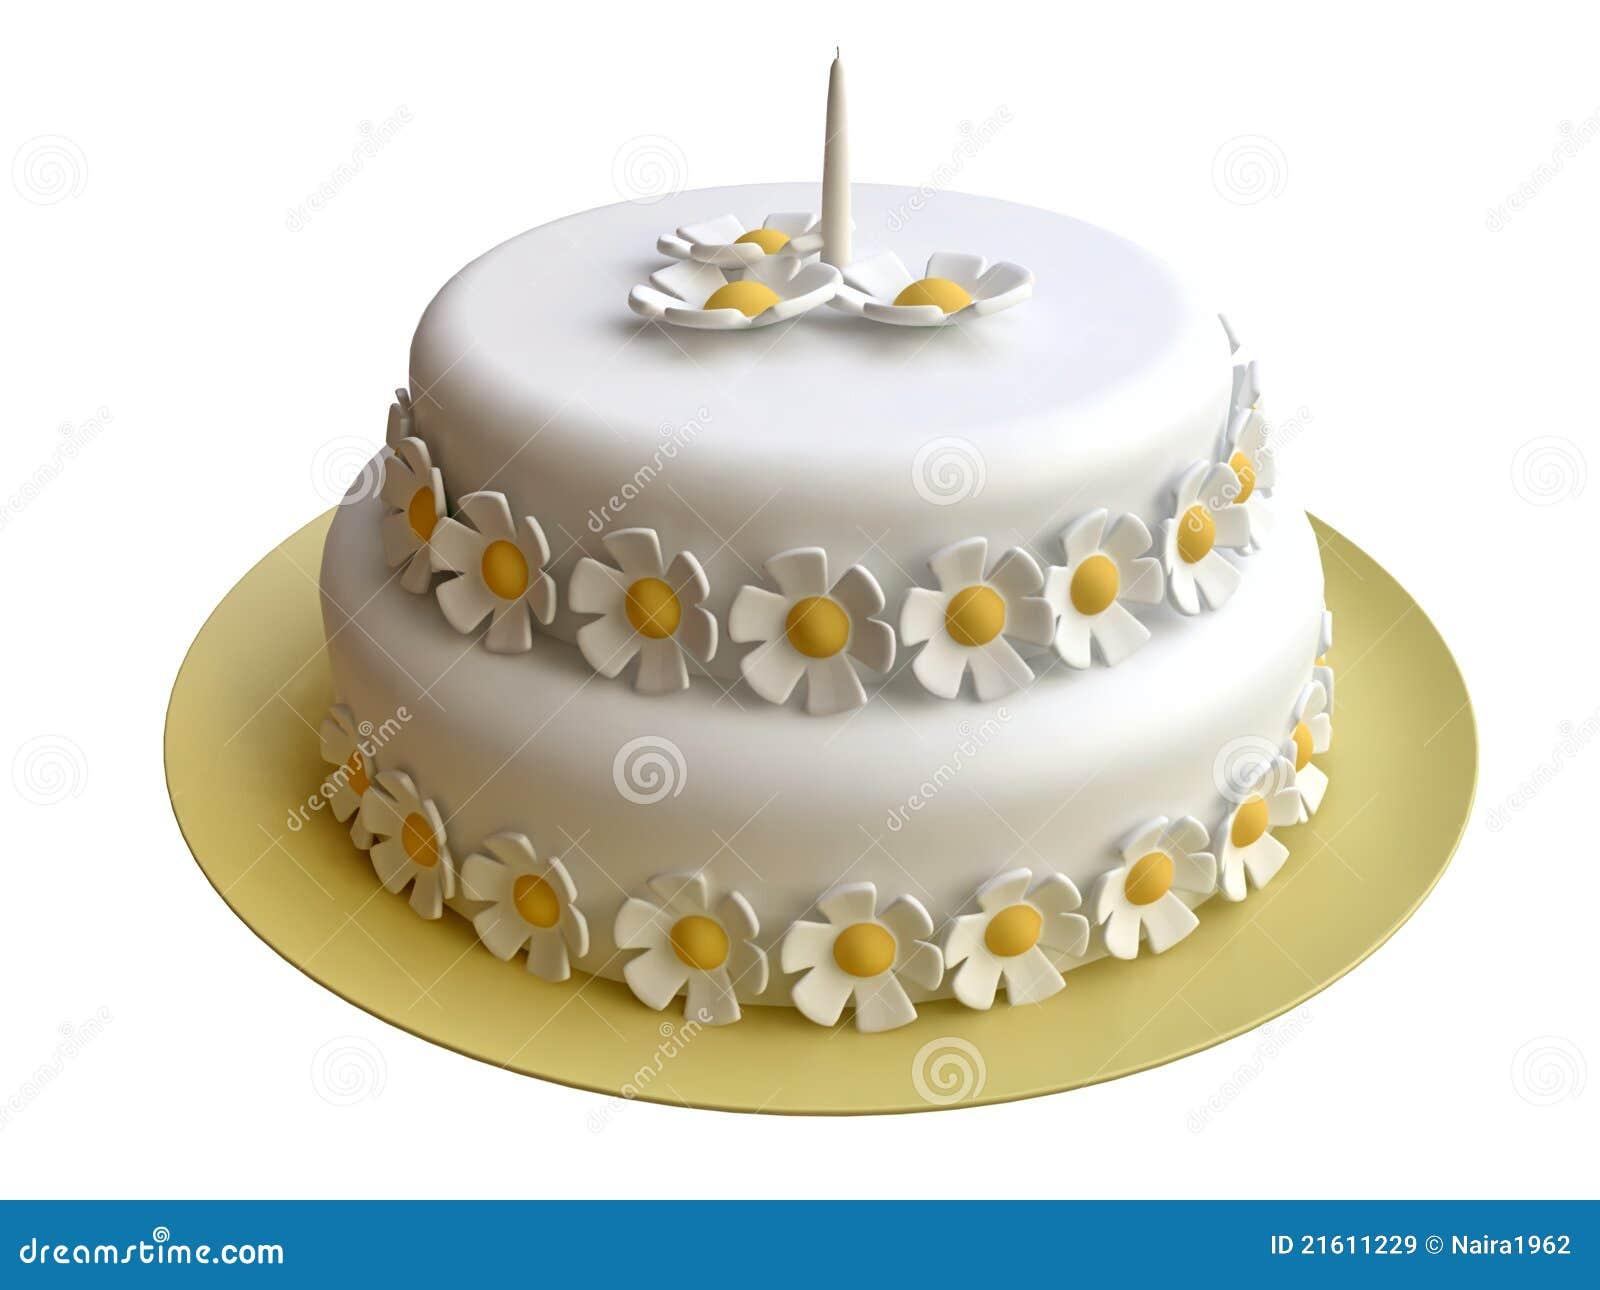 Birthday cake decorated with marzipan flowers stock illustration birthday cake decorated with marzipan flowers izmirmasajfo